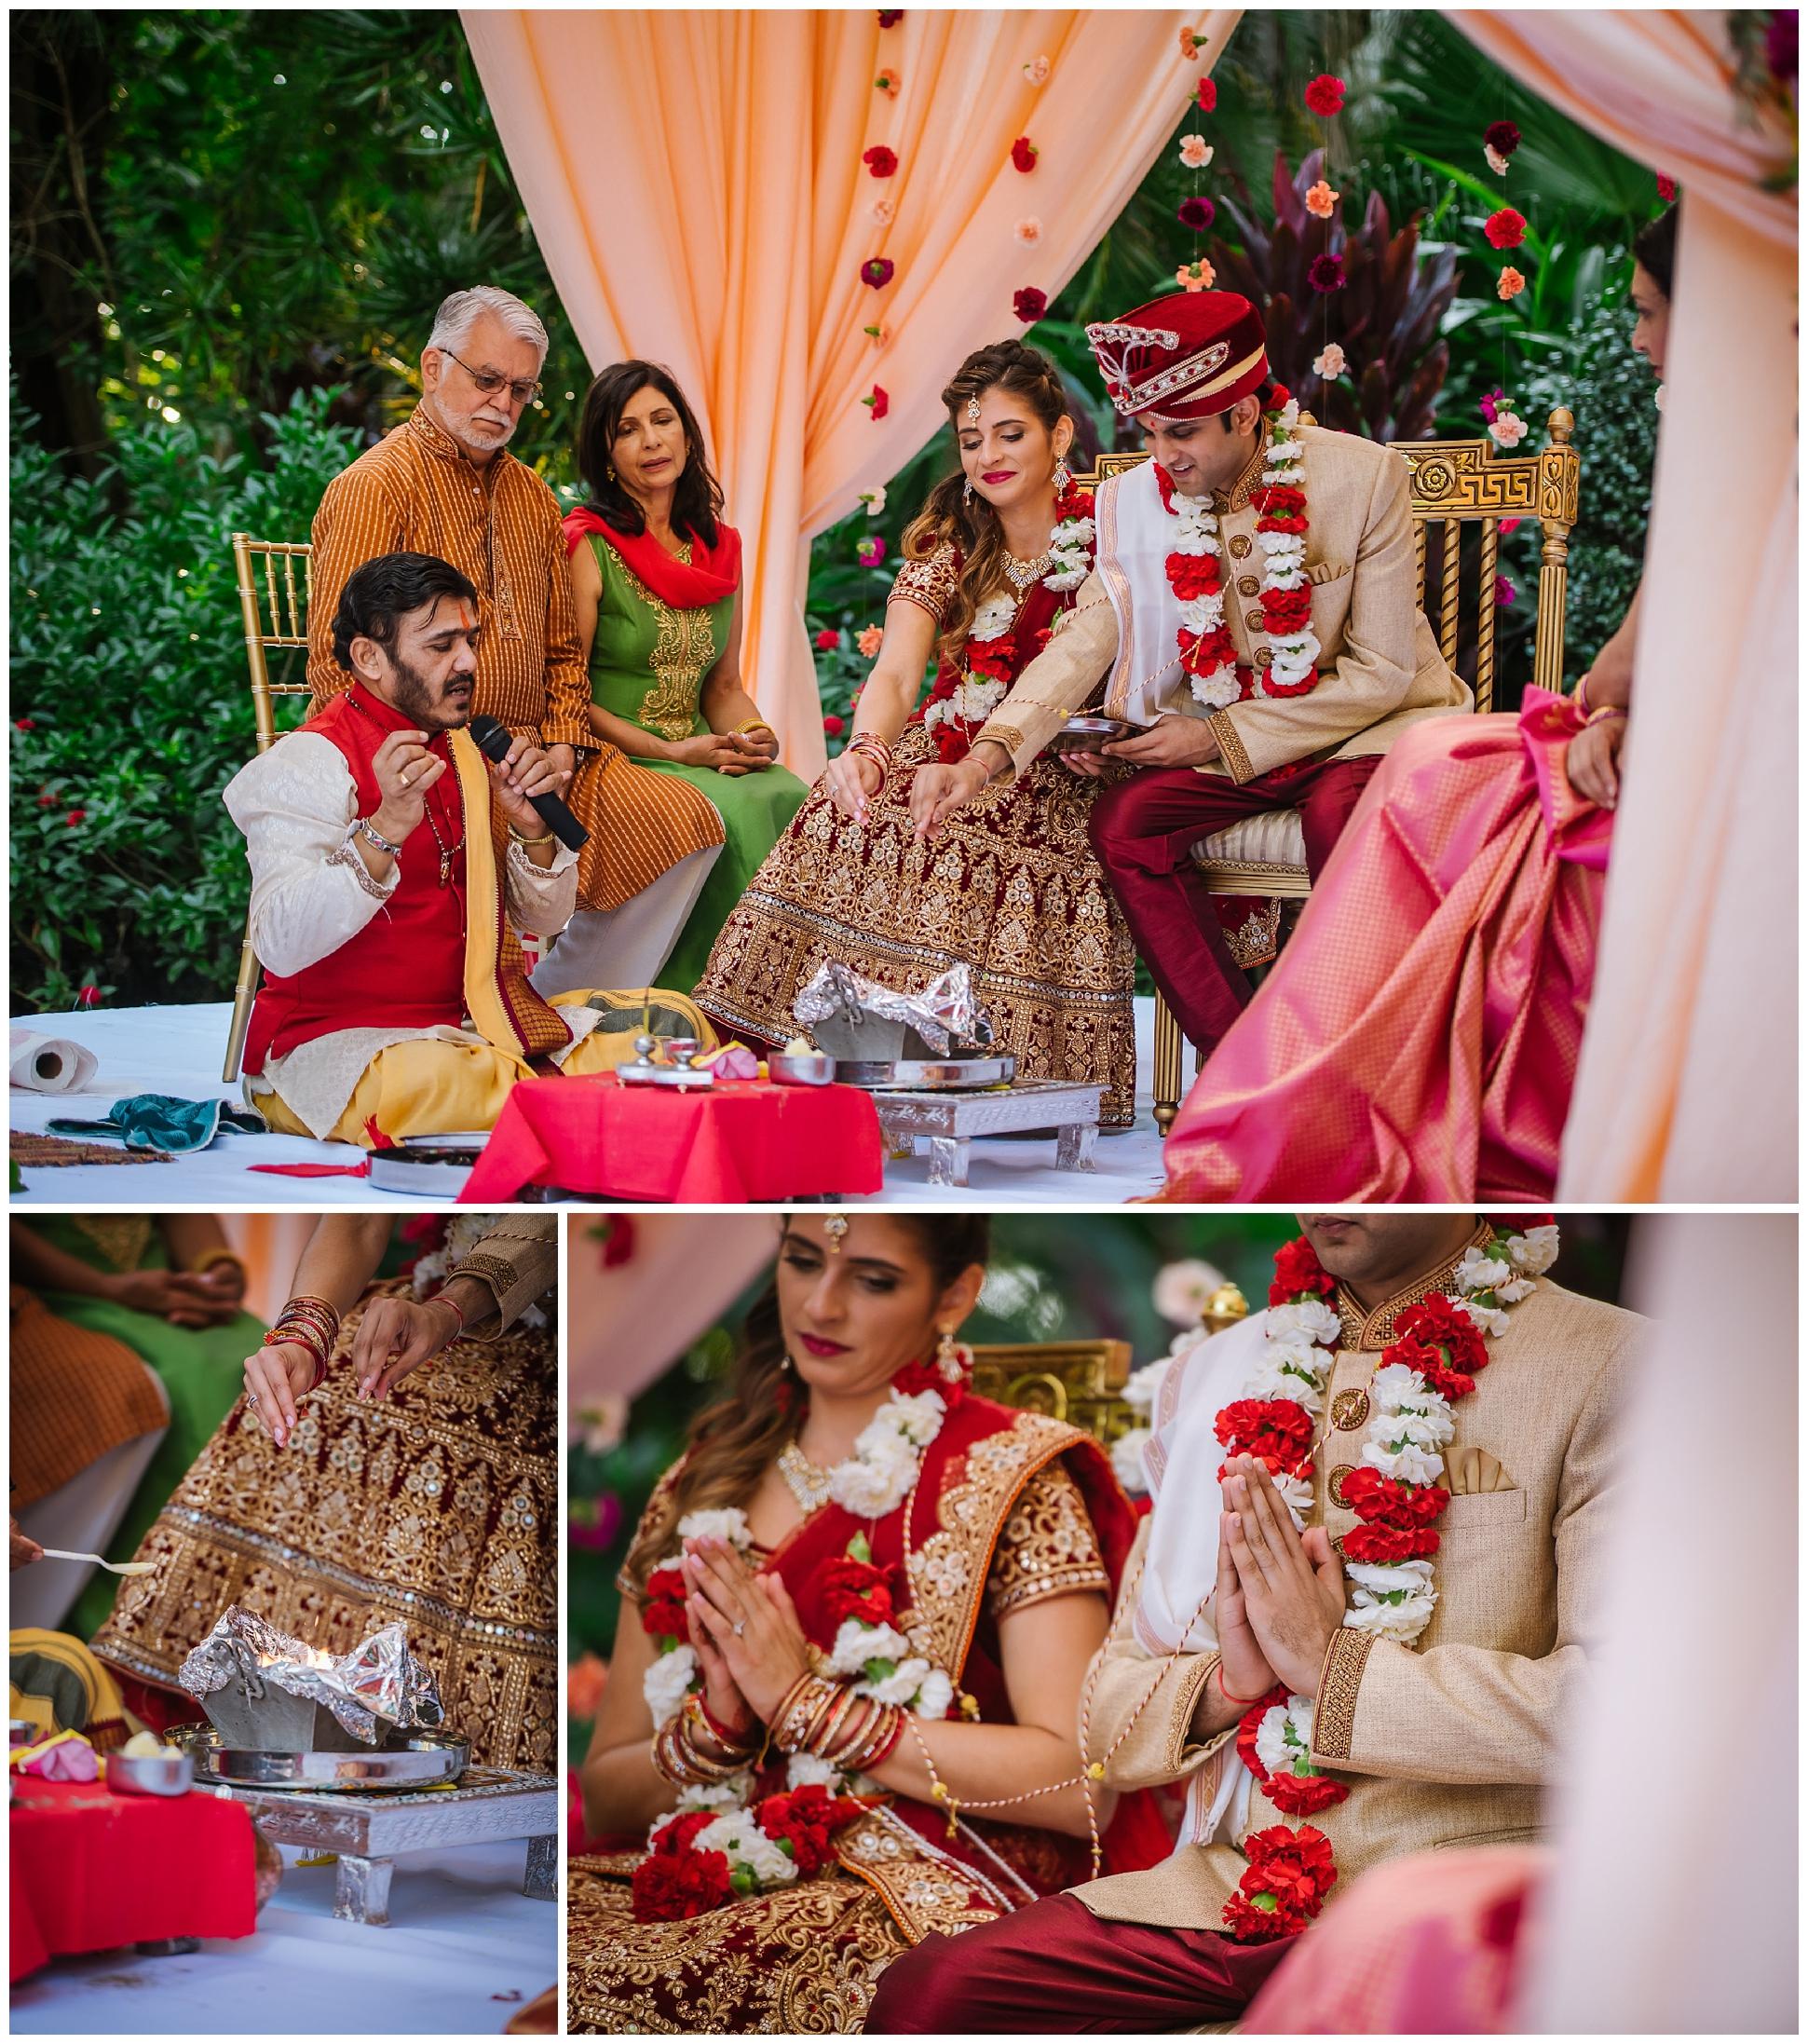 St-pete-indian-wedding-photographer-barat-sunken-gardens_0117.jpg